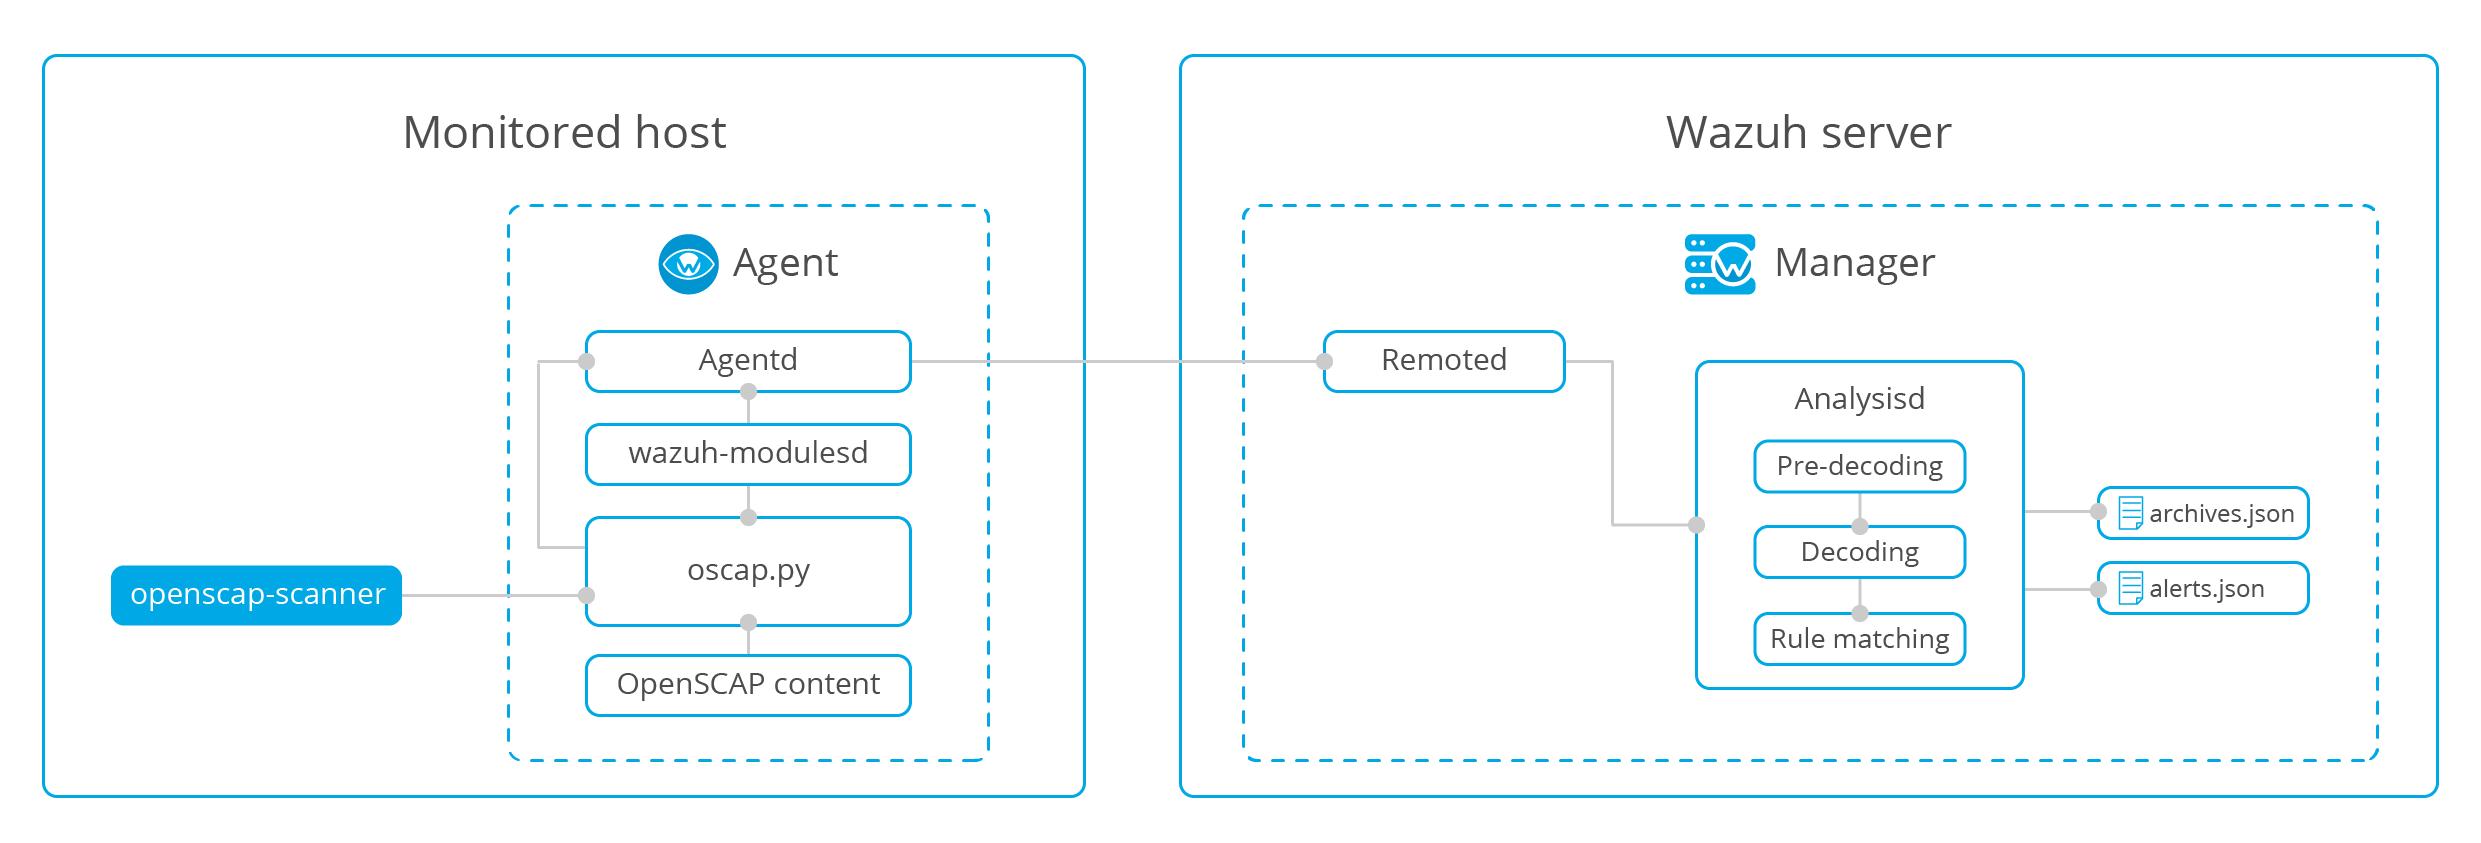 How it works ‐ OpenSCAP · Wazuh 3 8 documentation